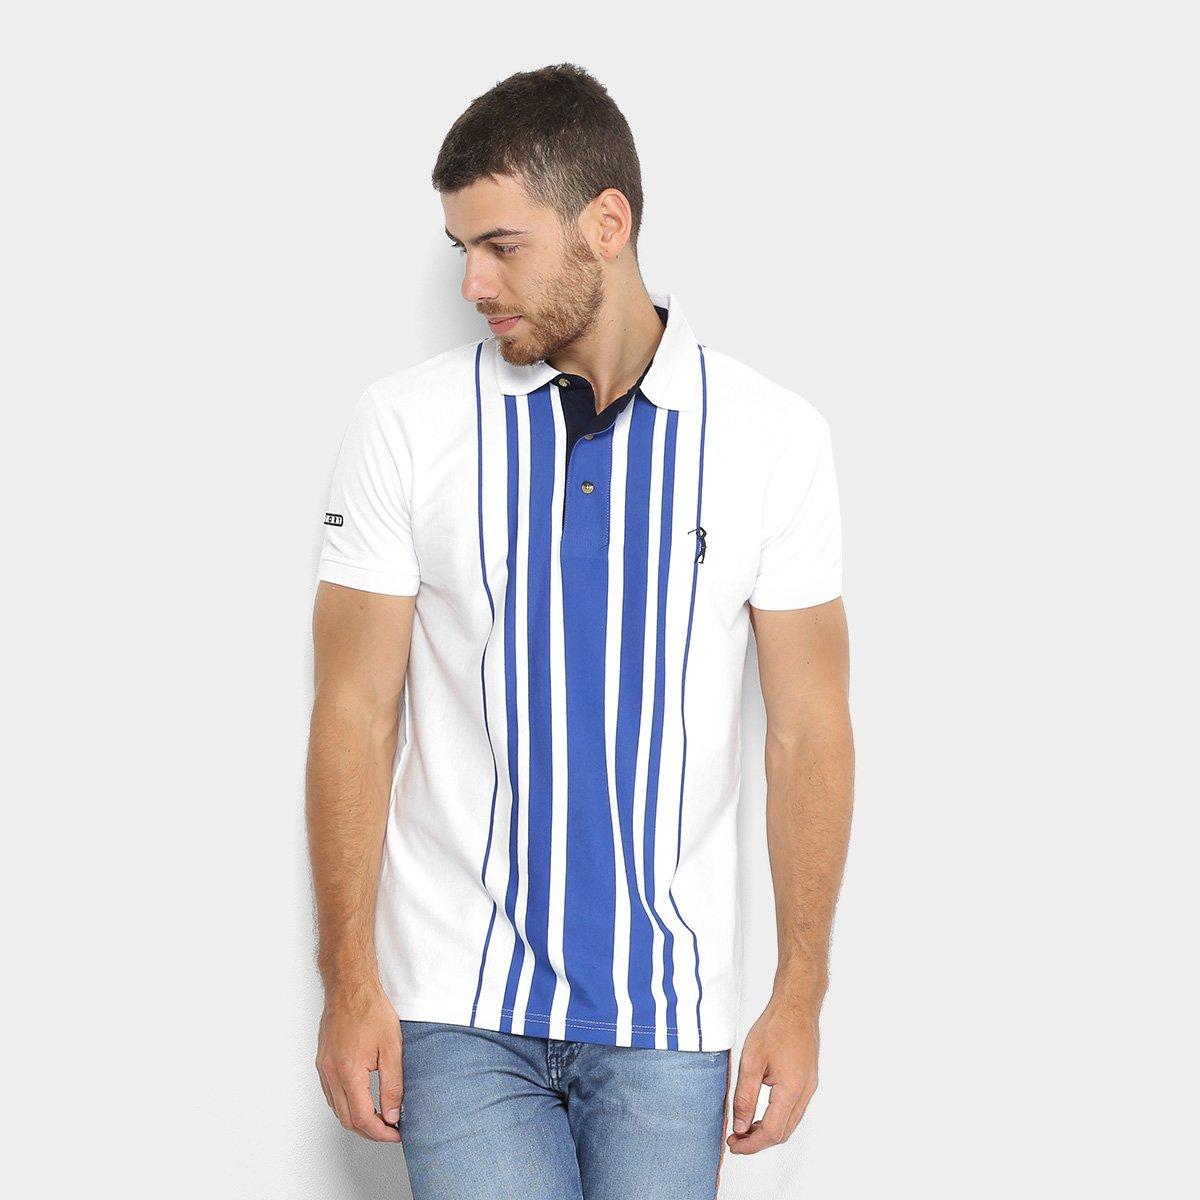 af4ea3b1c1 Camisa Polo Aleatory Fio Tinto Listrada Masculina - Compre Agora ...